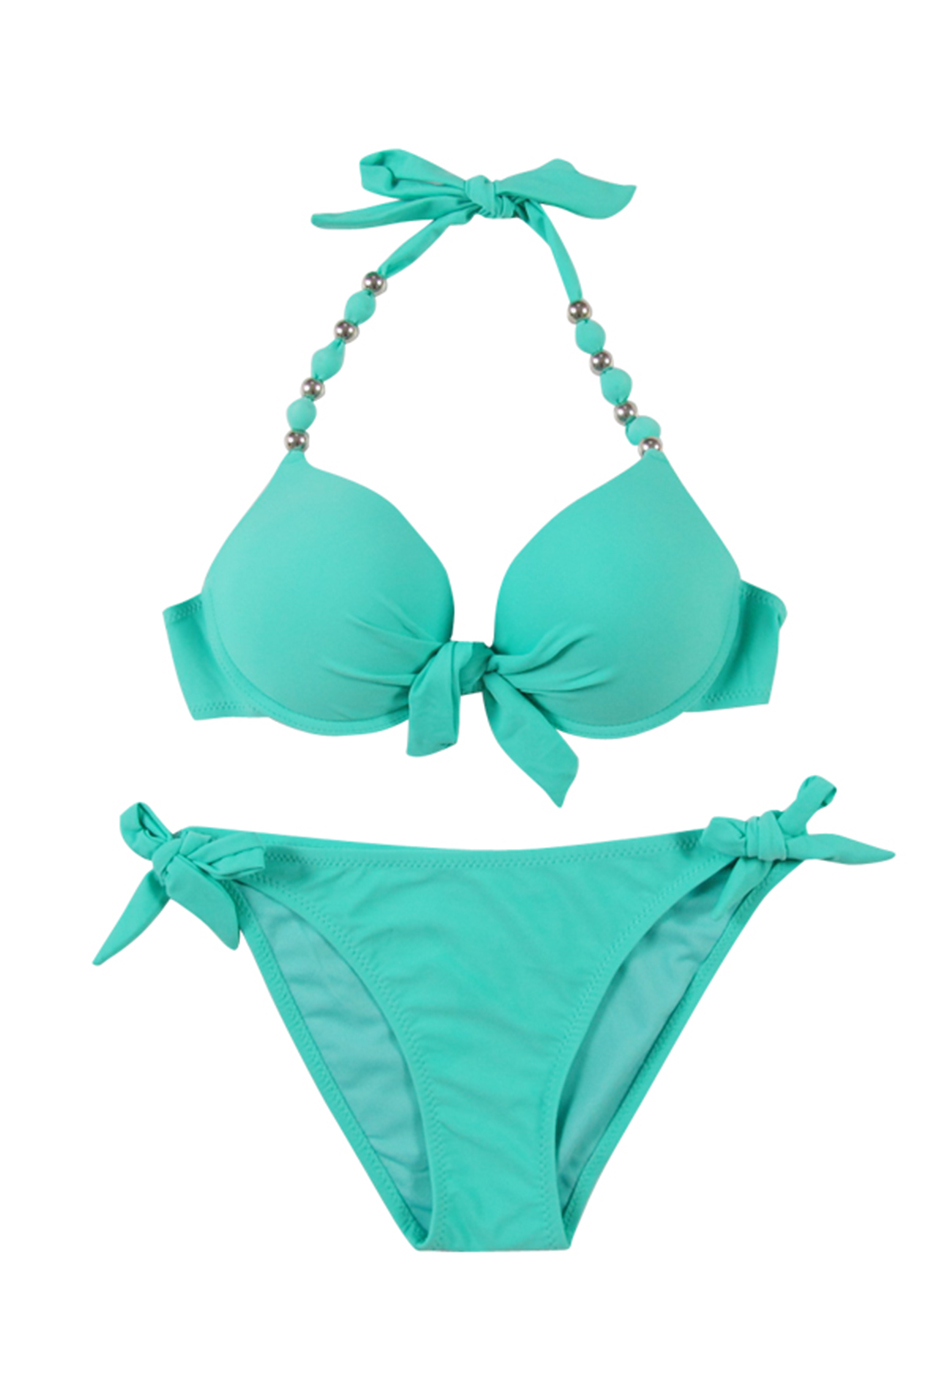 Faerdasi Halter Bikini Set Low Waist Bathing Suits Women Sexy Push Up Beachwear with Tie Side and Center Bow Swimwear Swimsuit 38